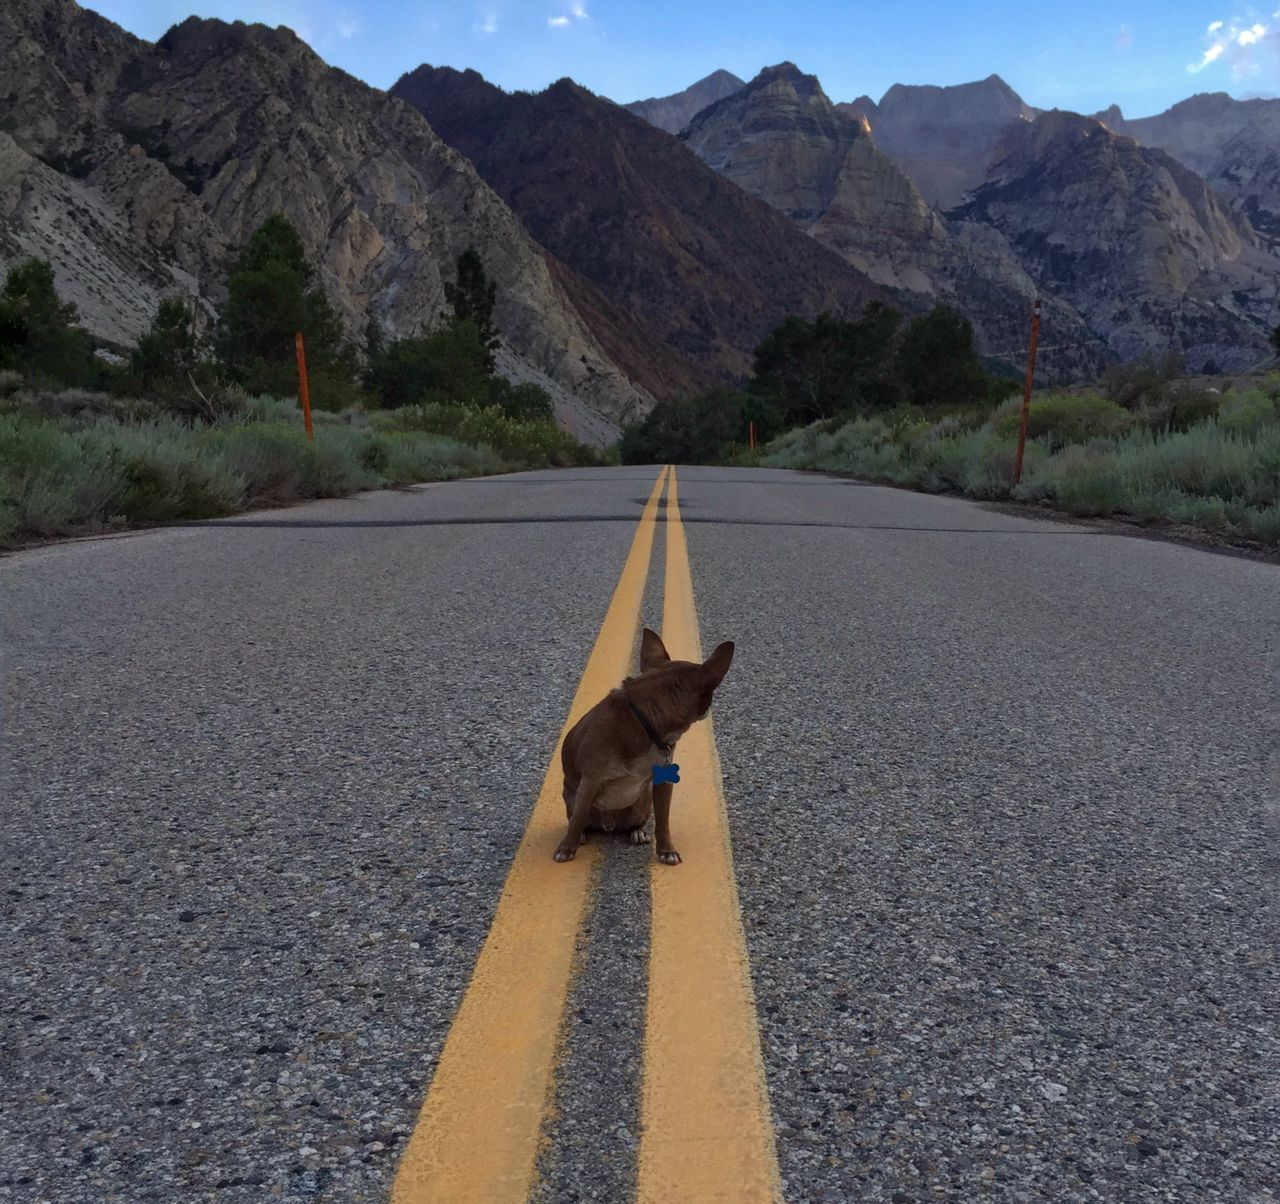 road, mountain, animal themes, one animal, mammal, the way forward, transportation, dog, mountain range, pets, domestic animals, day, outdoors, asphalt, nature, no people